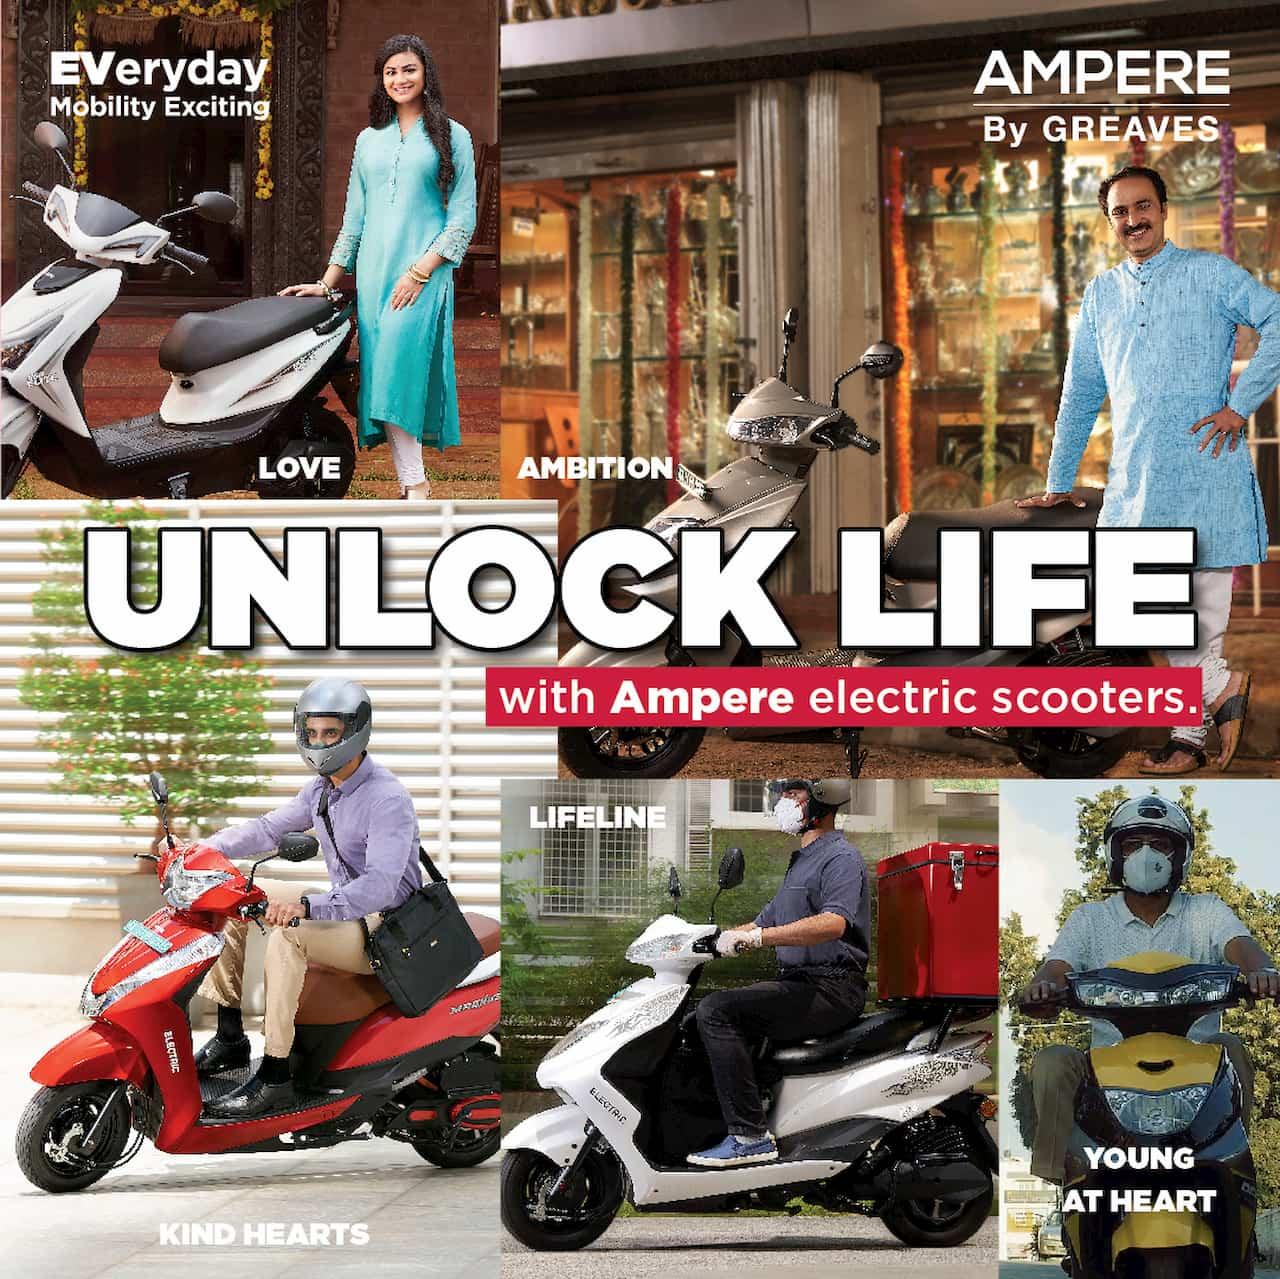 Ampere Electric Unlock Life campaign